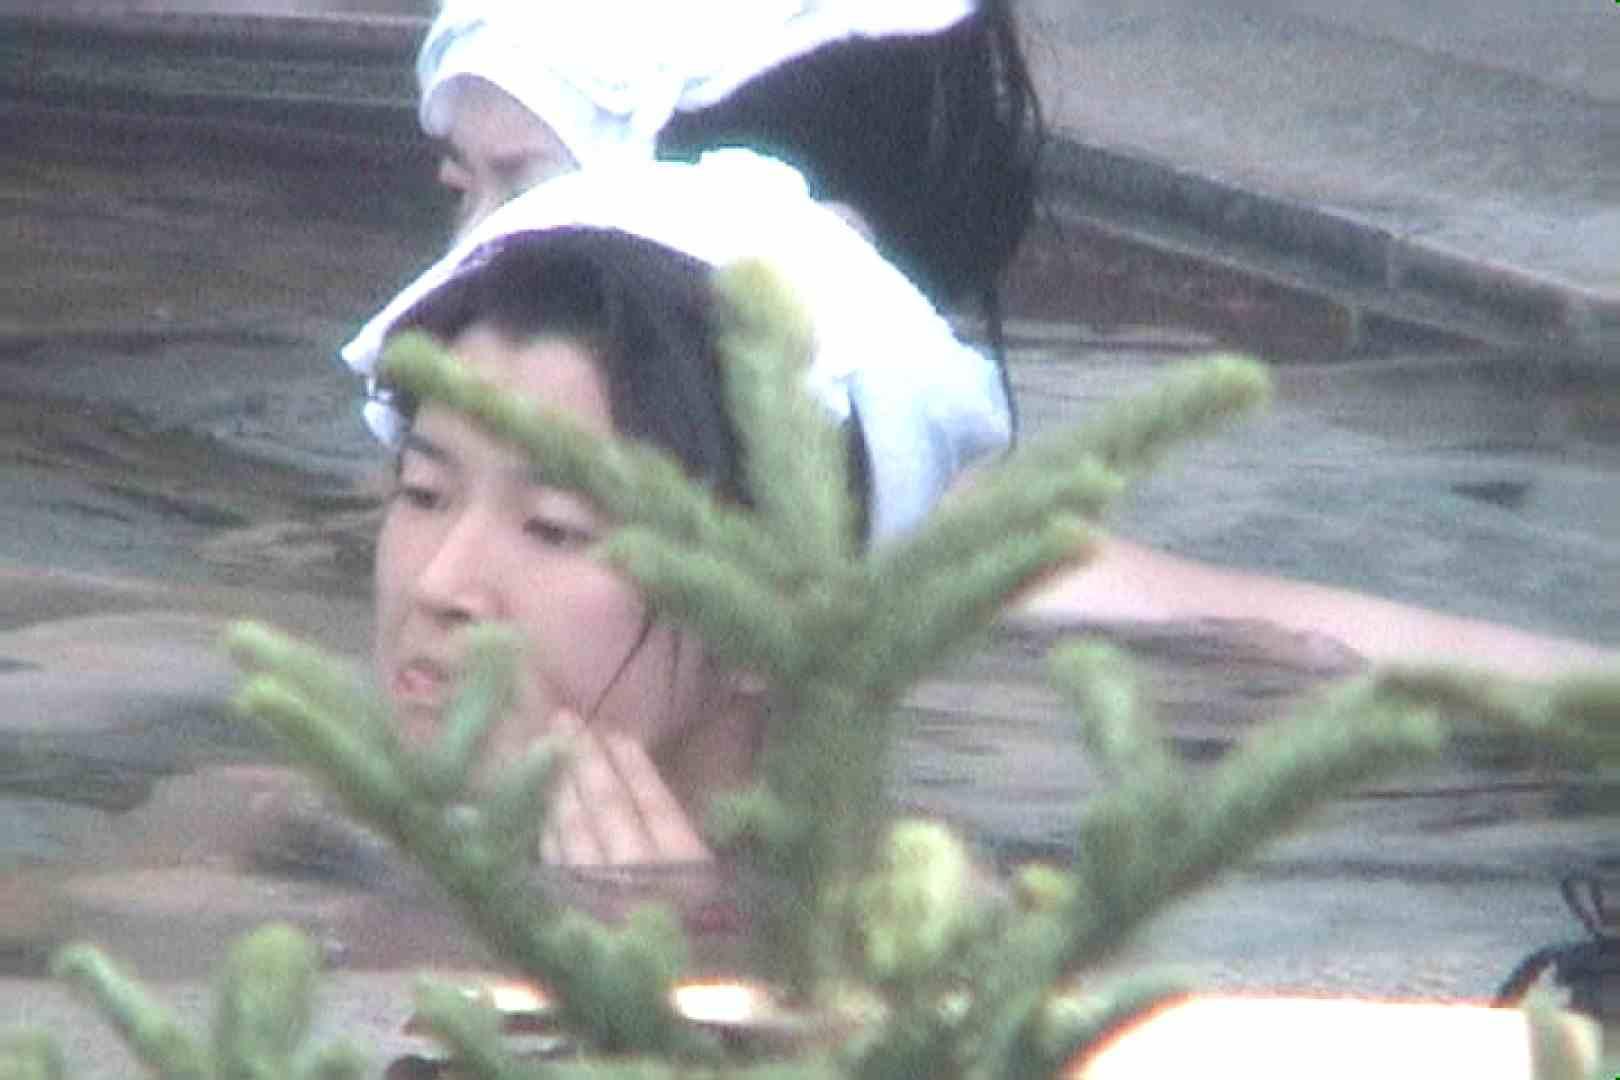 Aquaな露天風呂Vol.80【VIP限定】 露天風呂編  76PIX 72